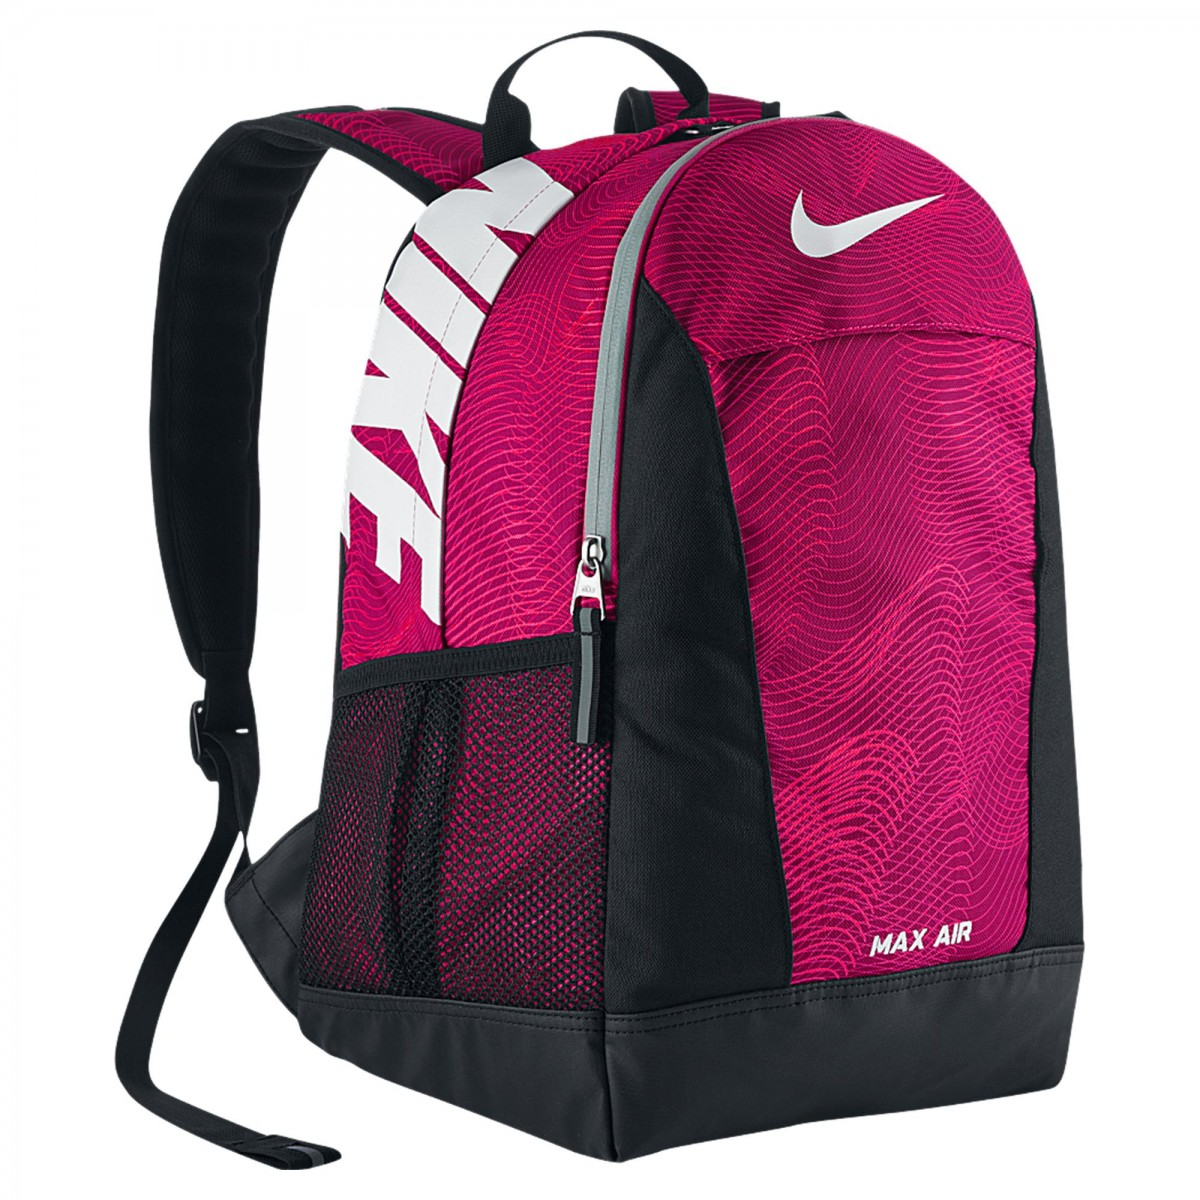 0cdd96dee Mochila Infantil Nike YA Max Air Team Porta Laptop Ba4736-639